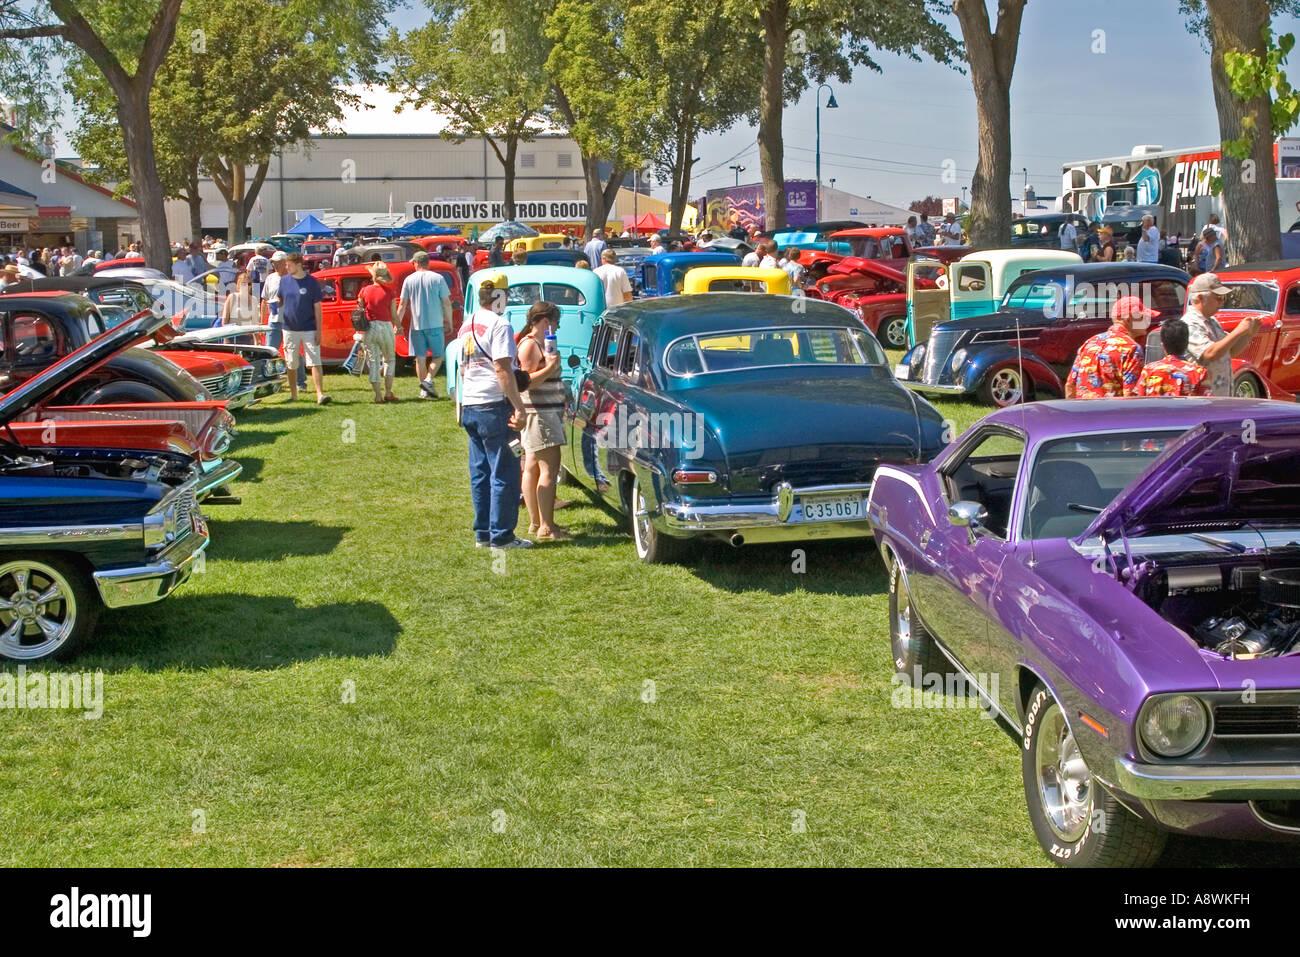 USA, Washington, Spokane, Goodguys Great Northwest Classic Car Show ...